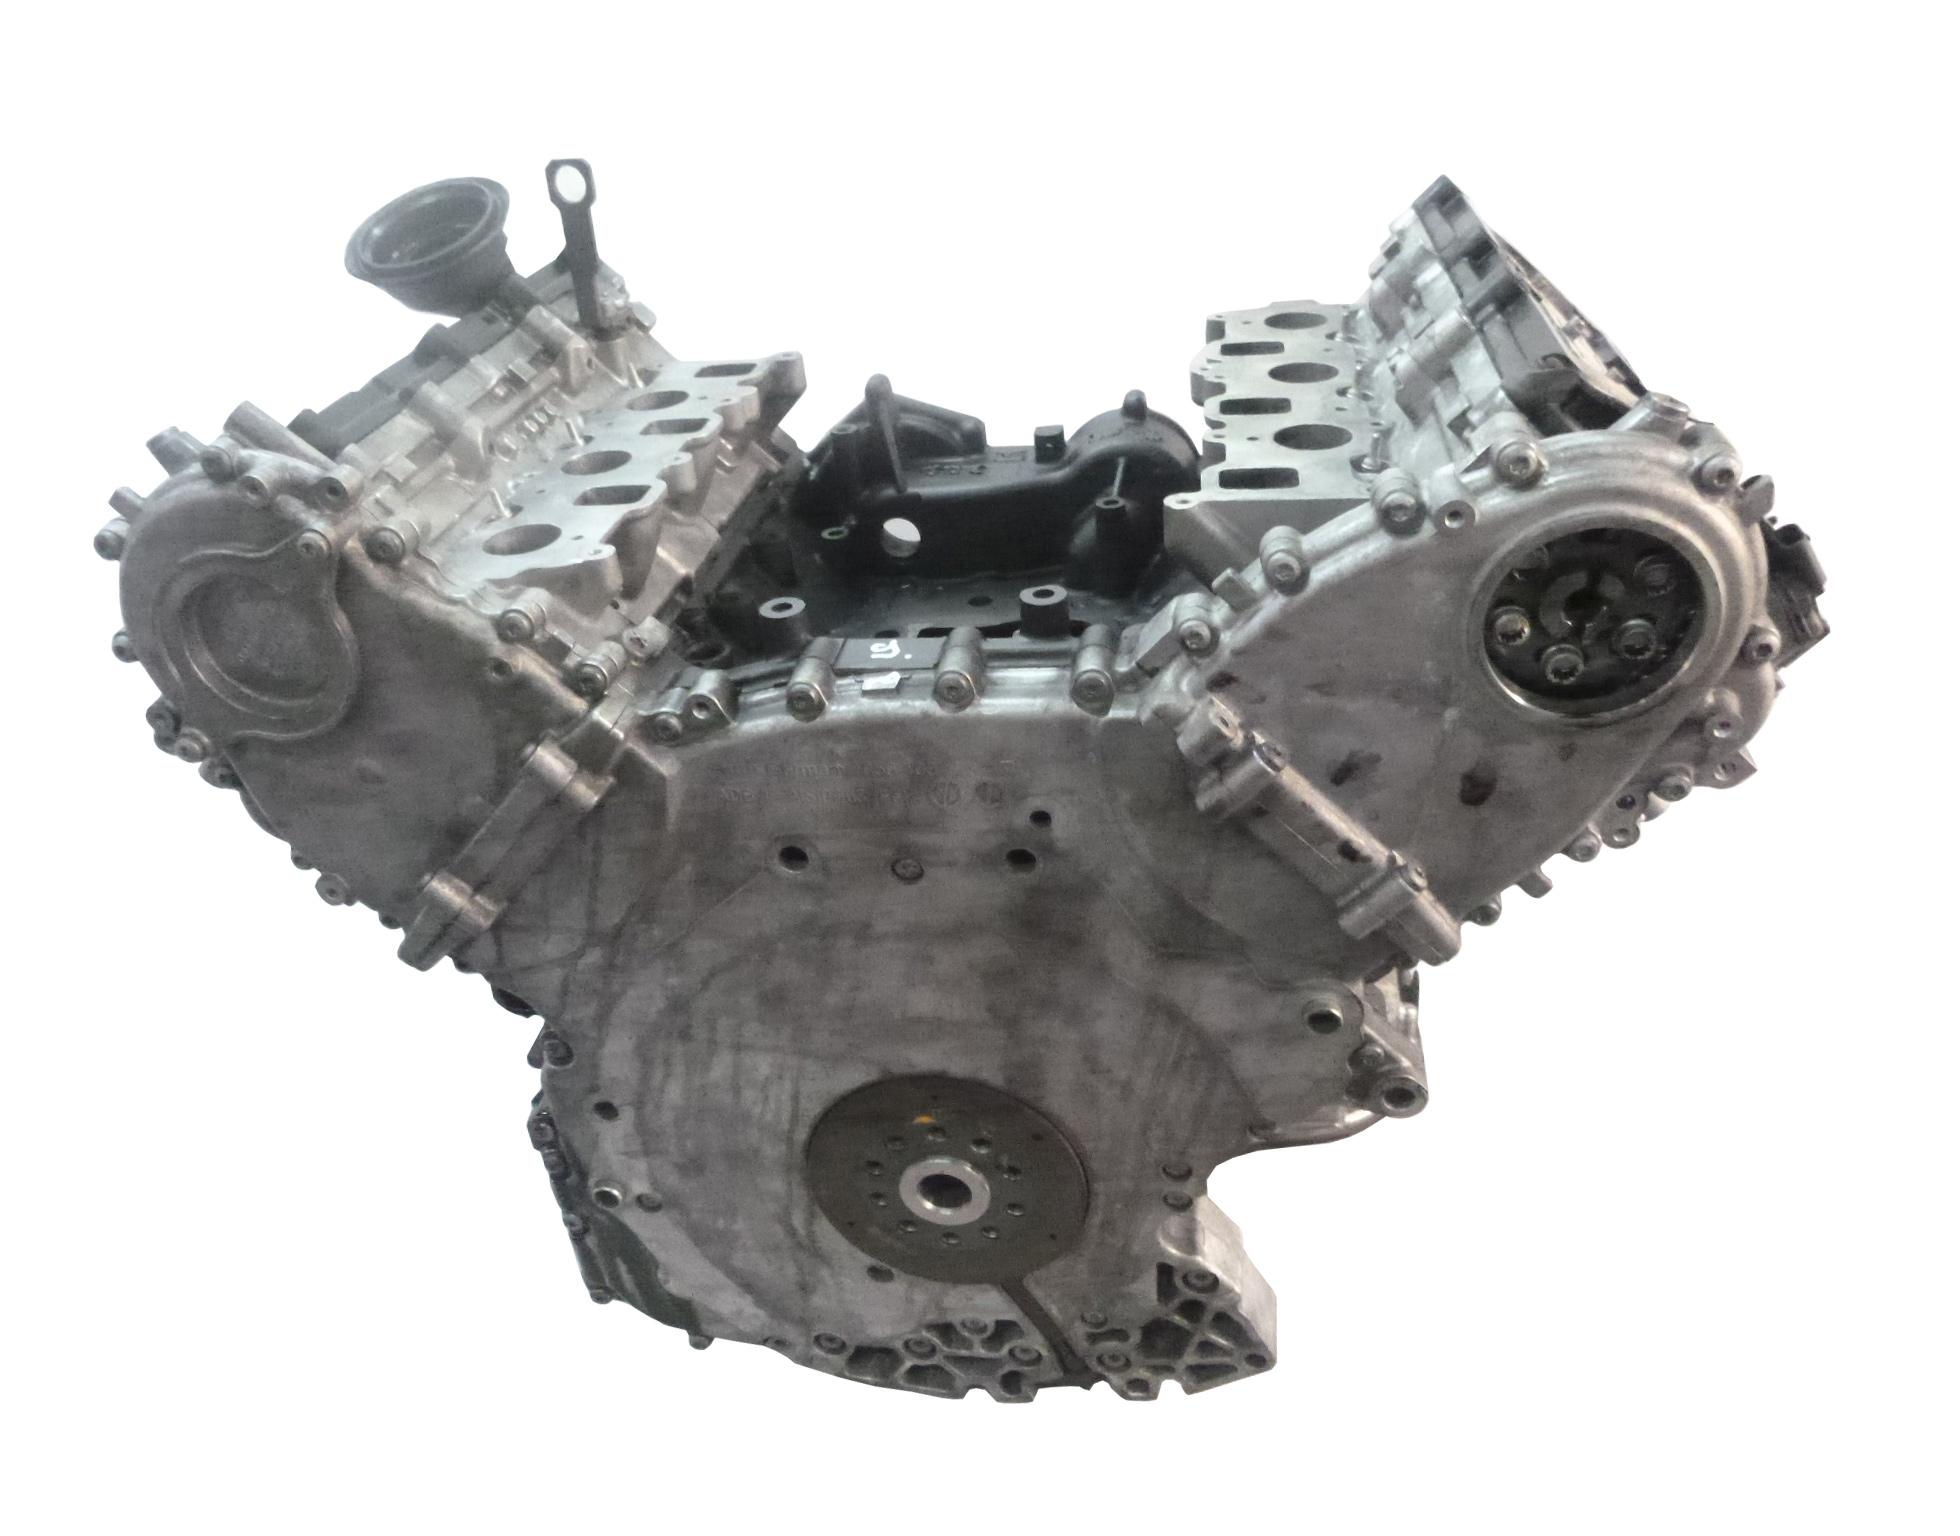 Motor Überholung Instandsetzung Reparatur Audi A4 A5 2,7 TDI V6 CAM CAMA